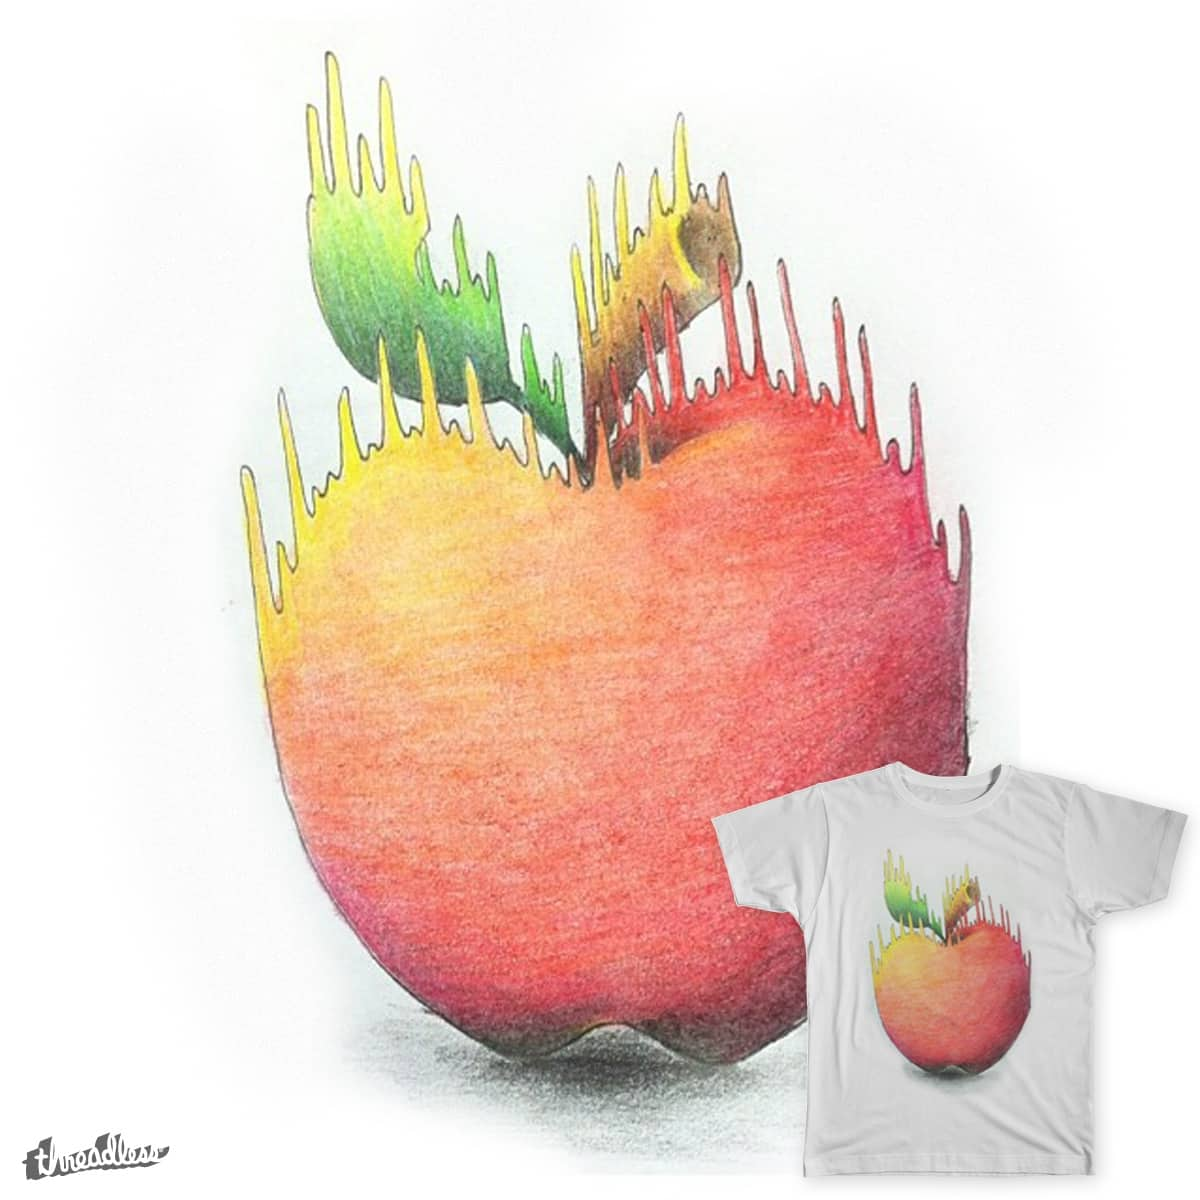 Apple by fraaaanco on Threadless